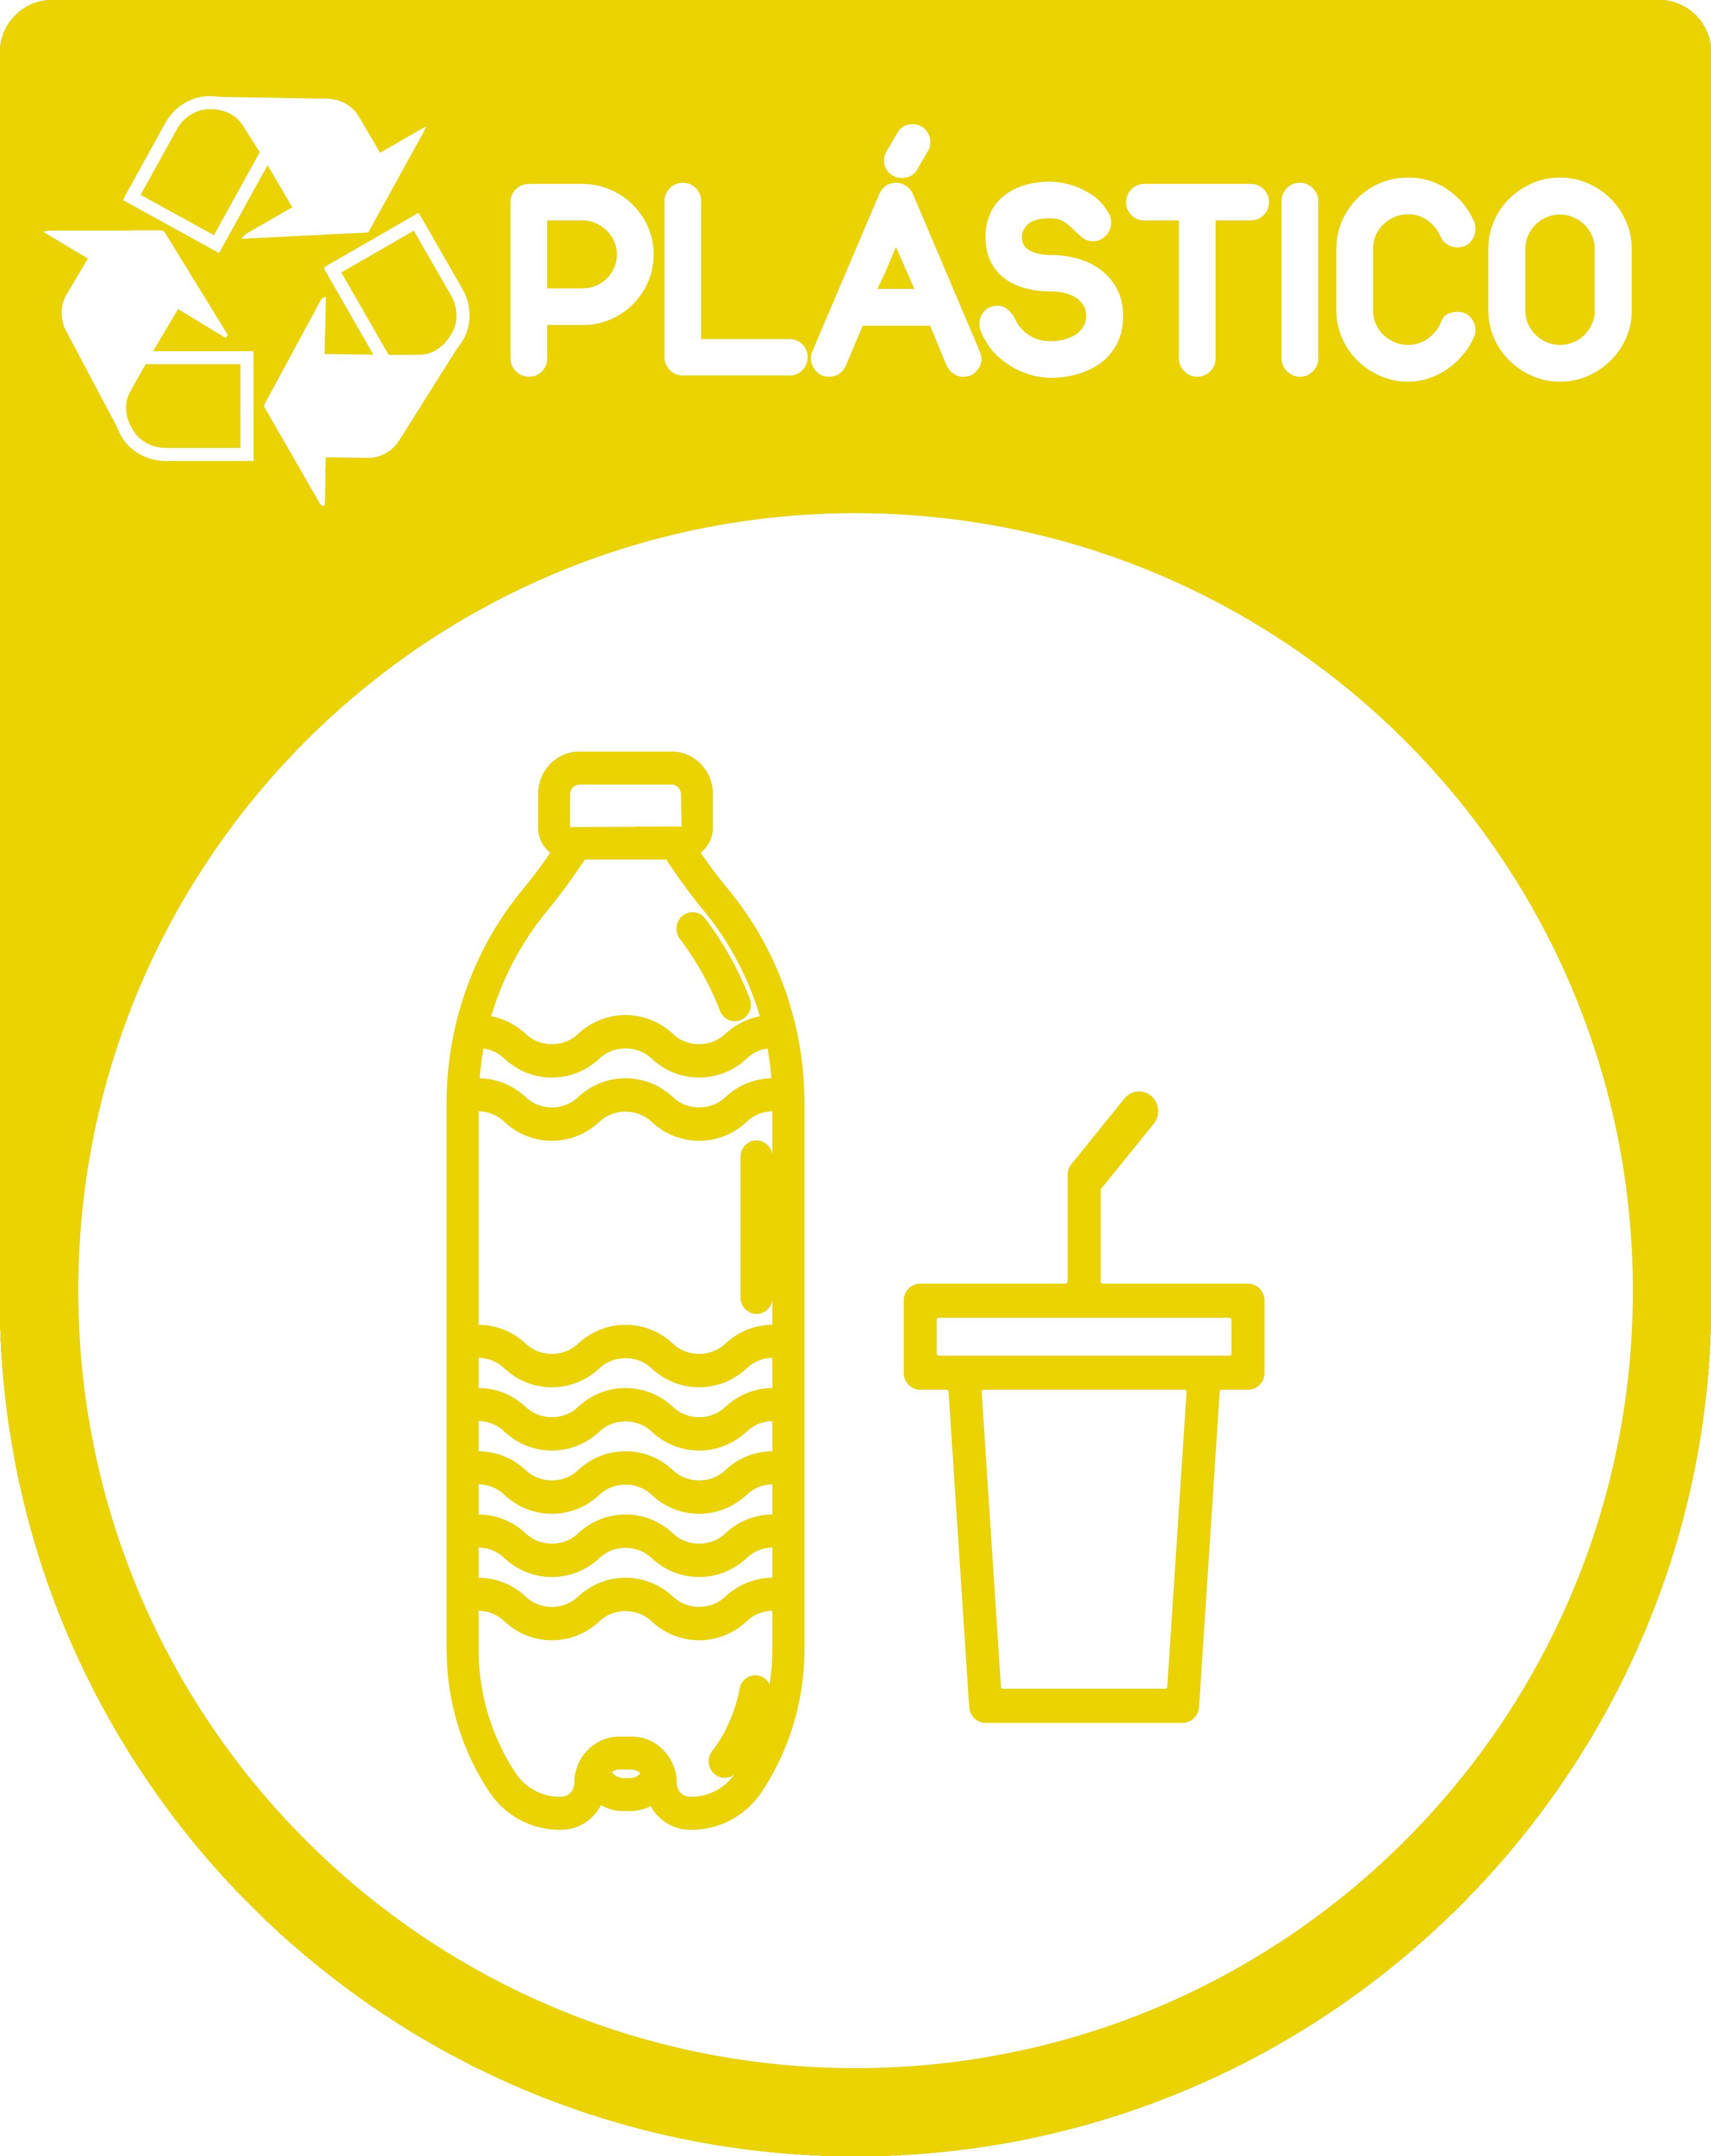 TenStickers. 플라스틱 재활용 표시 스티커. 부엌, 차고 및 공공 및 거리 공간의 쓰레기통에 배치하는 플라스틱 재활용 아이콘 스티커. 모든 크기로 제공됩니다.